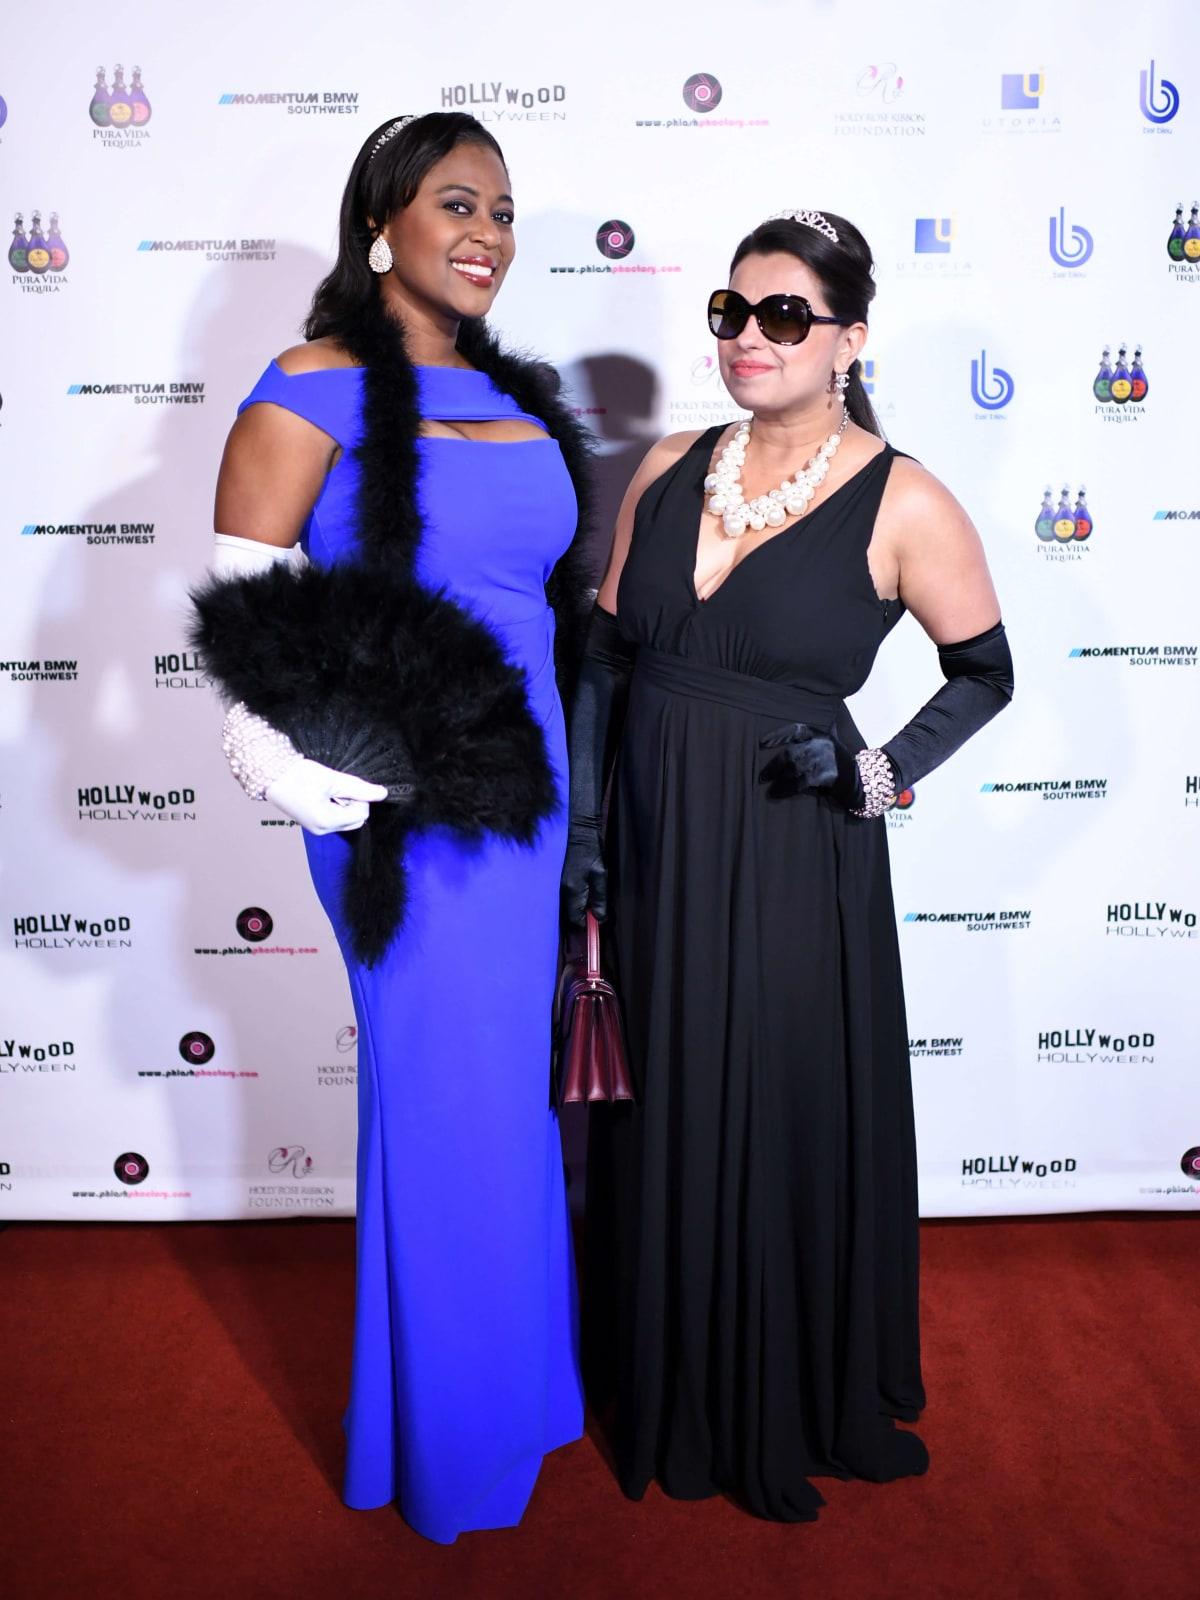 Houston, Hollywood Hollyween Party, Oct. 2016, Sharron Melton, Ruchi Mukerjee